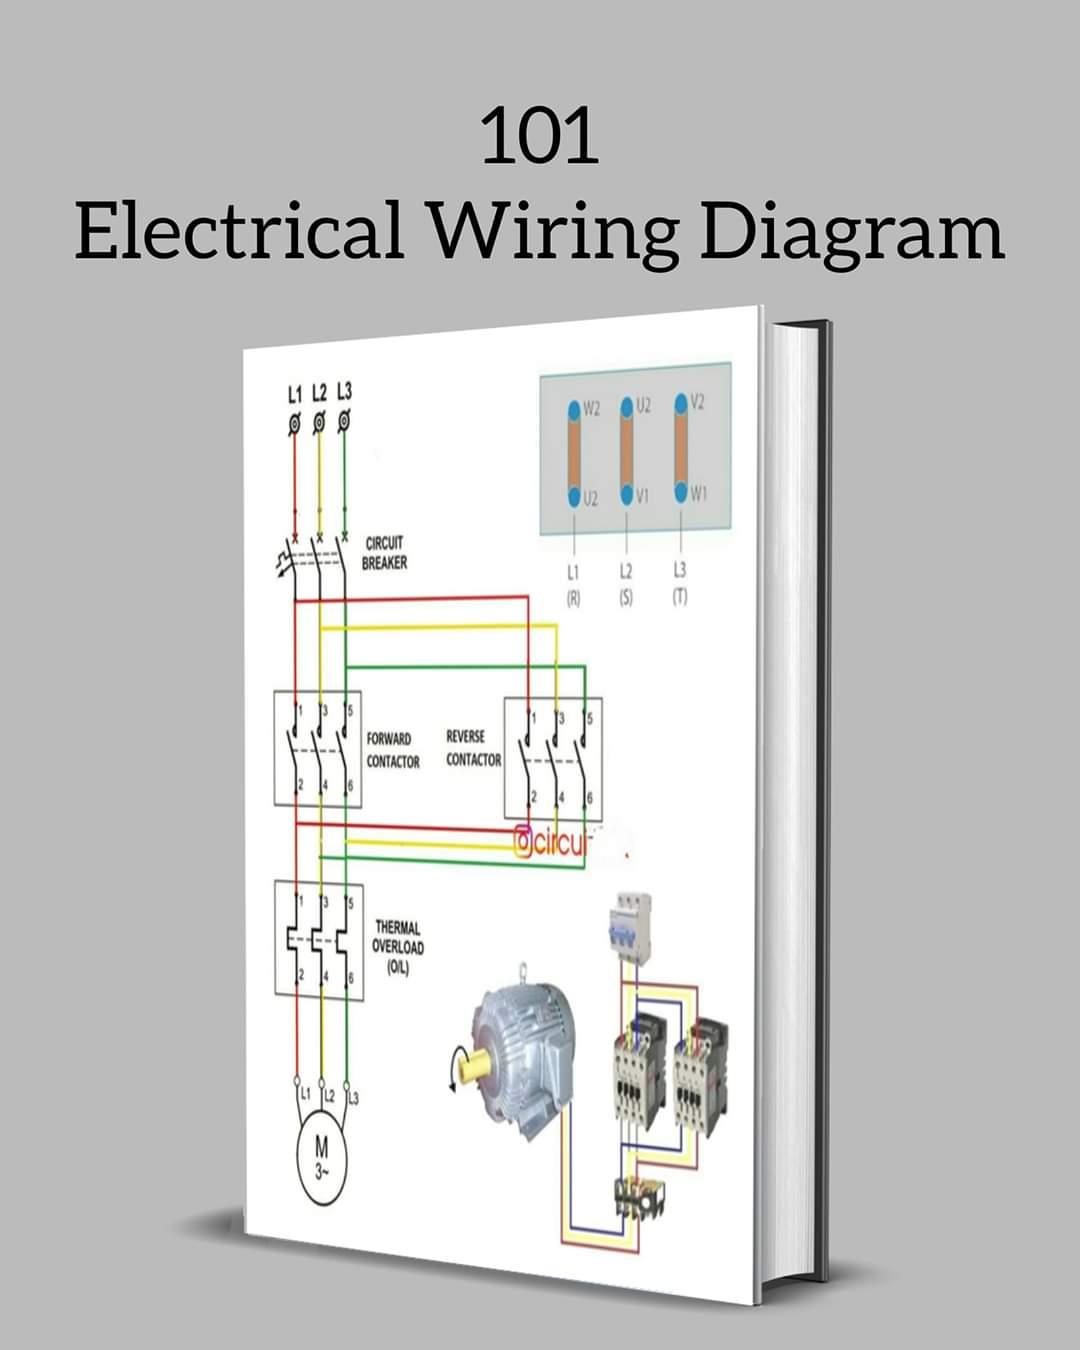 101 Electrical Wiring Diagram